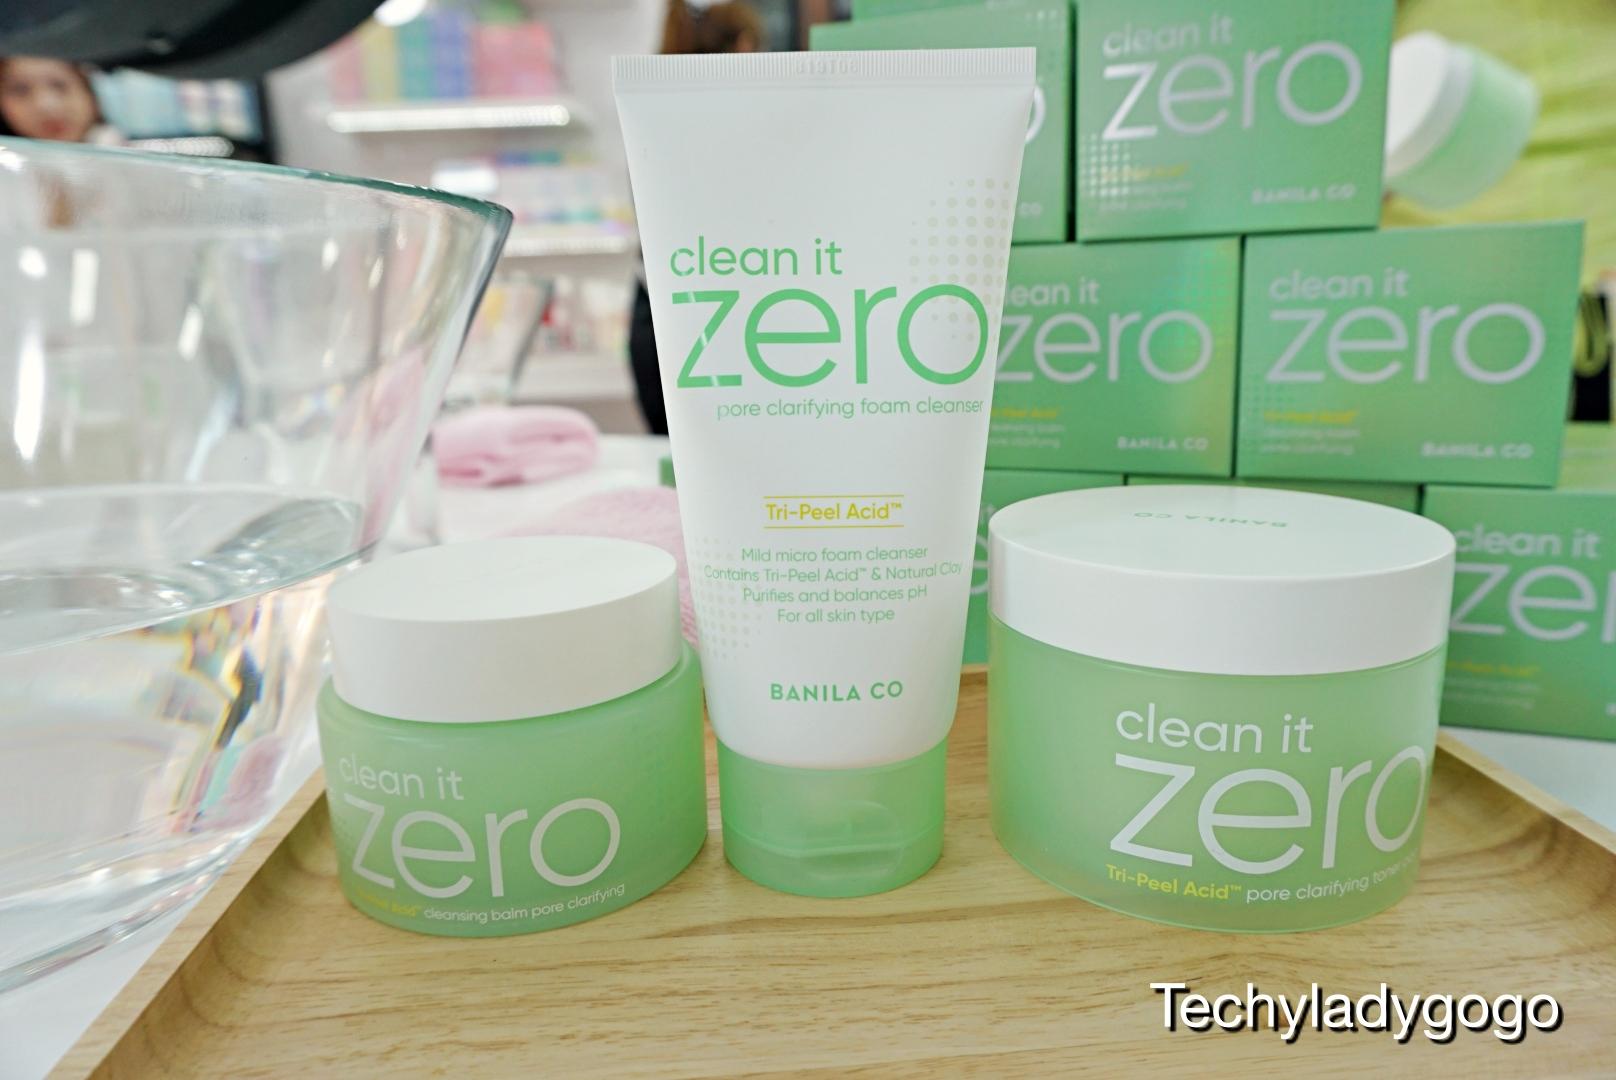 Banila Co Clean It Zero Pore Clarifying Collection เซทล้างหน้าสีเขียว สำหรับผิวมัน